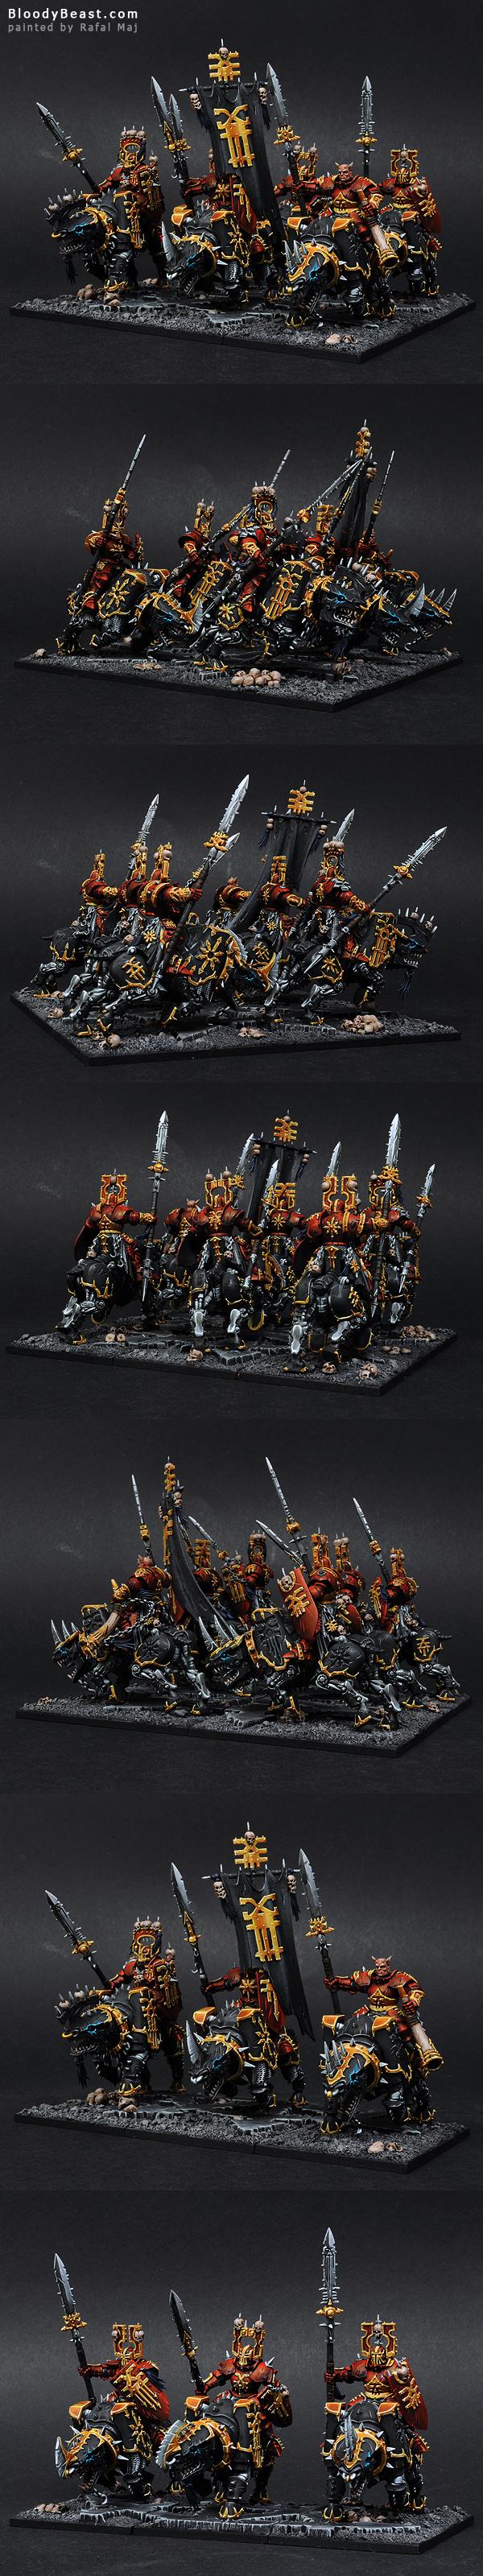 Skullcrushers of Khorne painted by Rafal Maj (BloodyBeast.com)